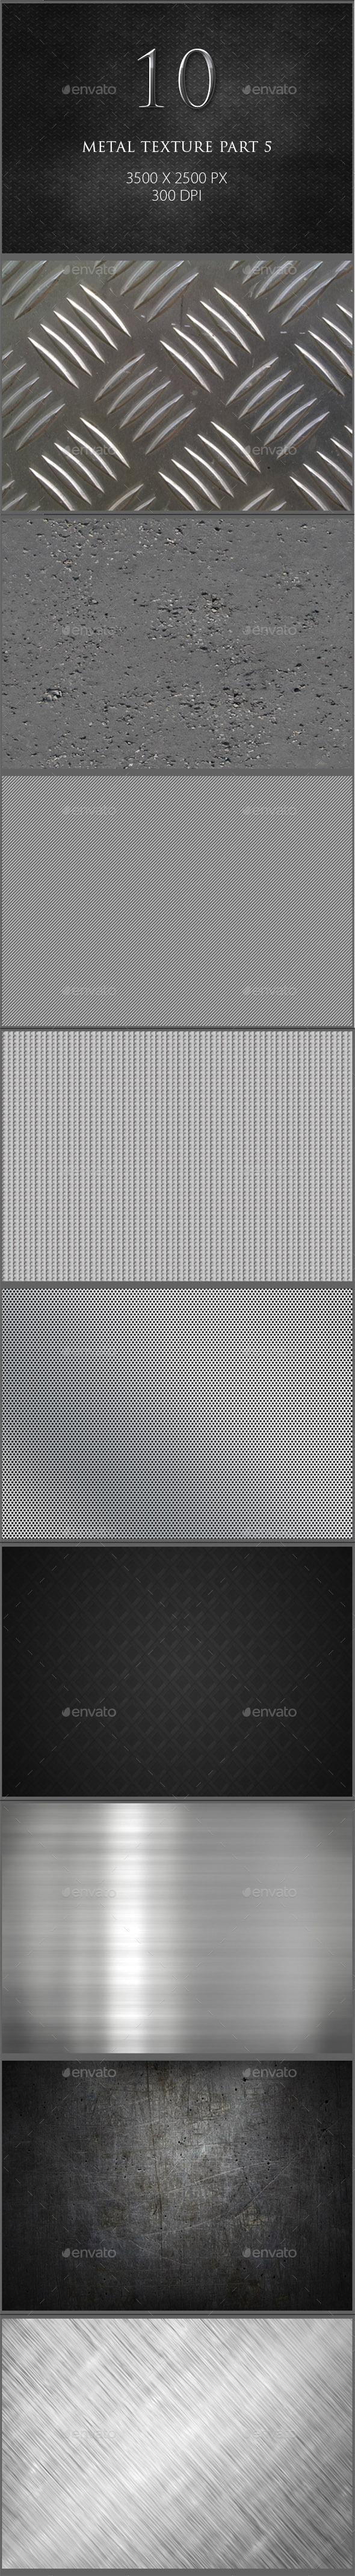 GraphicRiver 10 Metal Texture Part 5 9543840